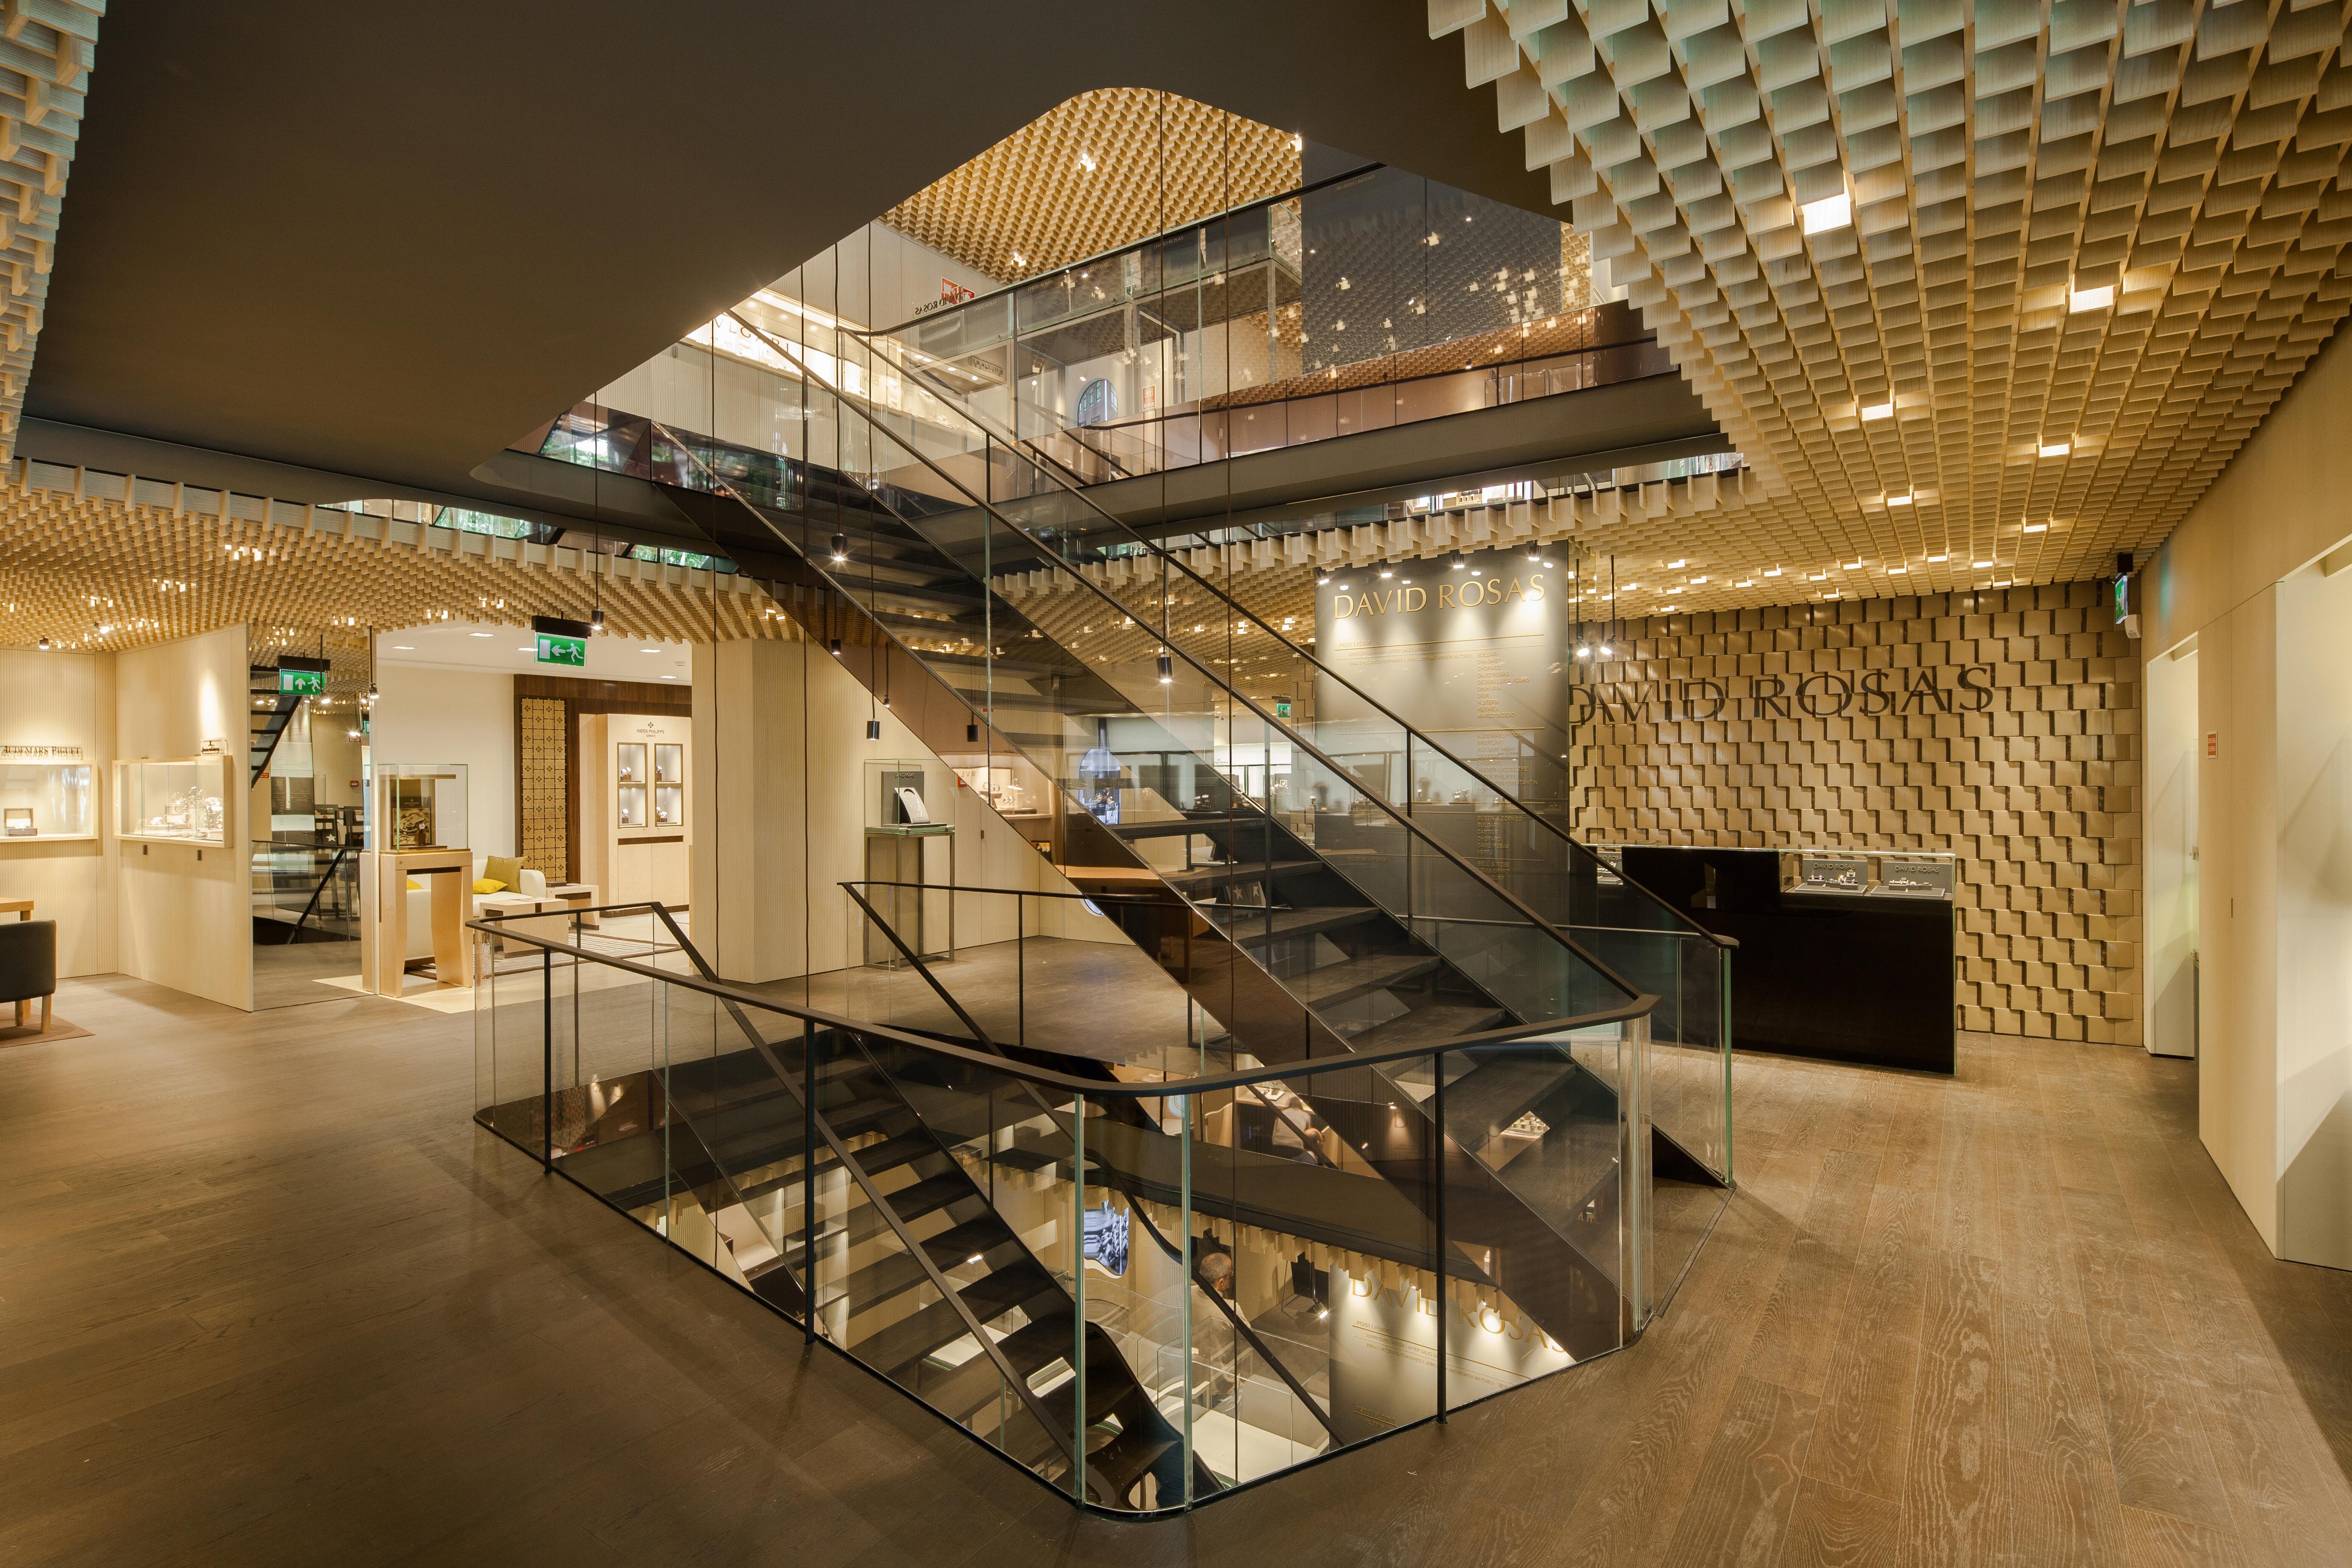 54bfa37bc5e David Rosas inaugura XL Store em Lisboa - The Gentleman